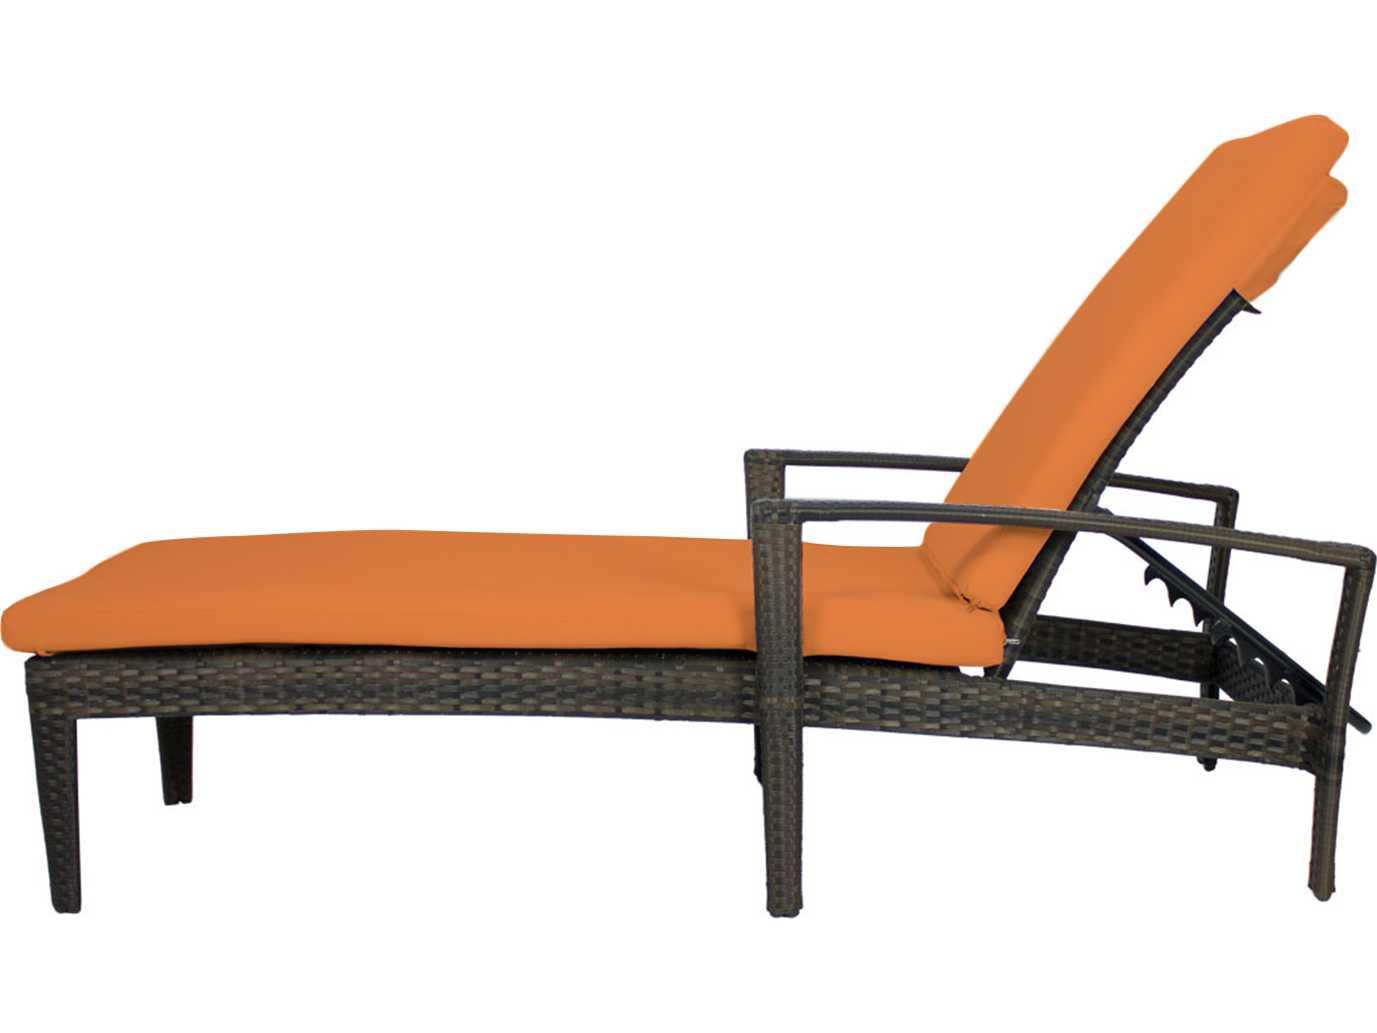 Source outdoor furniture zen wicker chaise scso2002104 for Source outdoor furniture